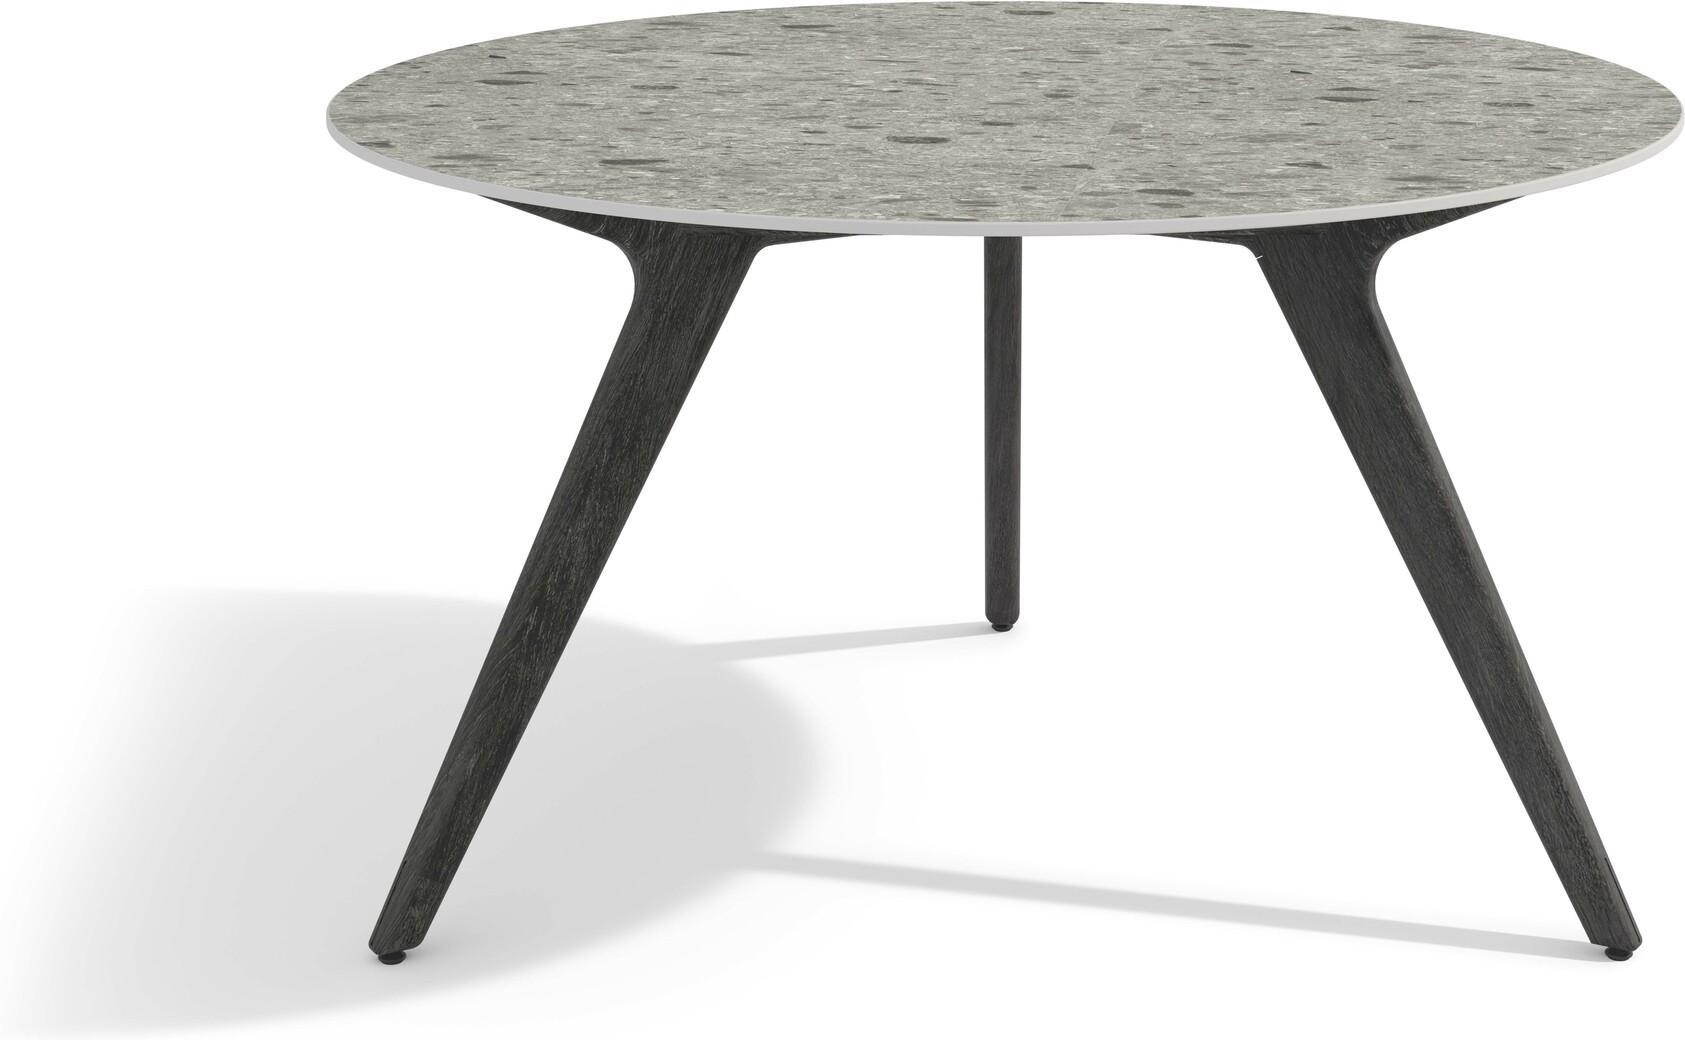 Table à manger Torsa - Teck nero - CF125